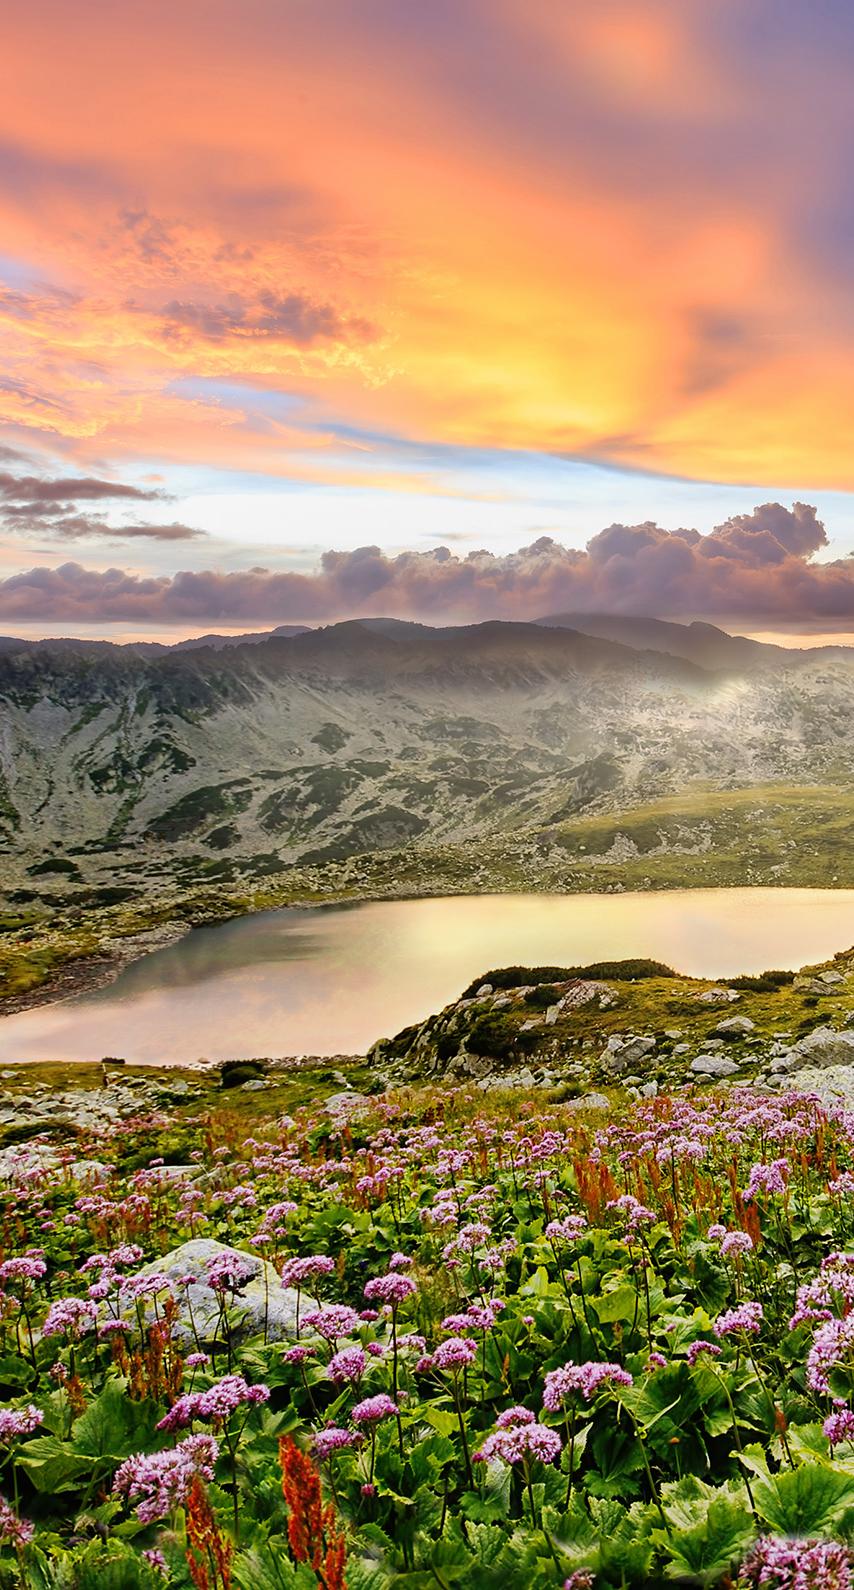 galaxy, fantasy, wild, summer, mountain, no person, dawn, cloud, outdoors, scenic, hill, sight, scenery